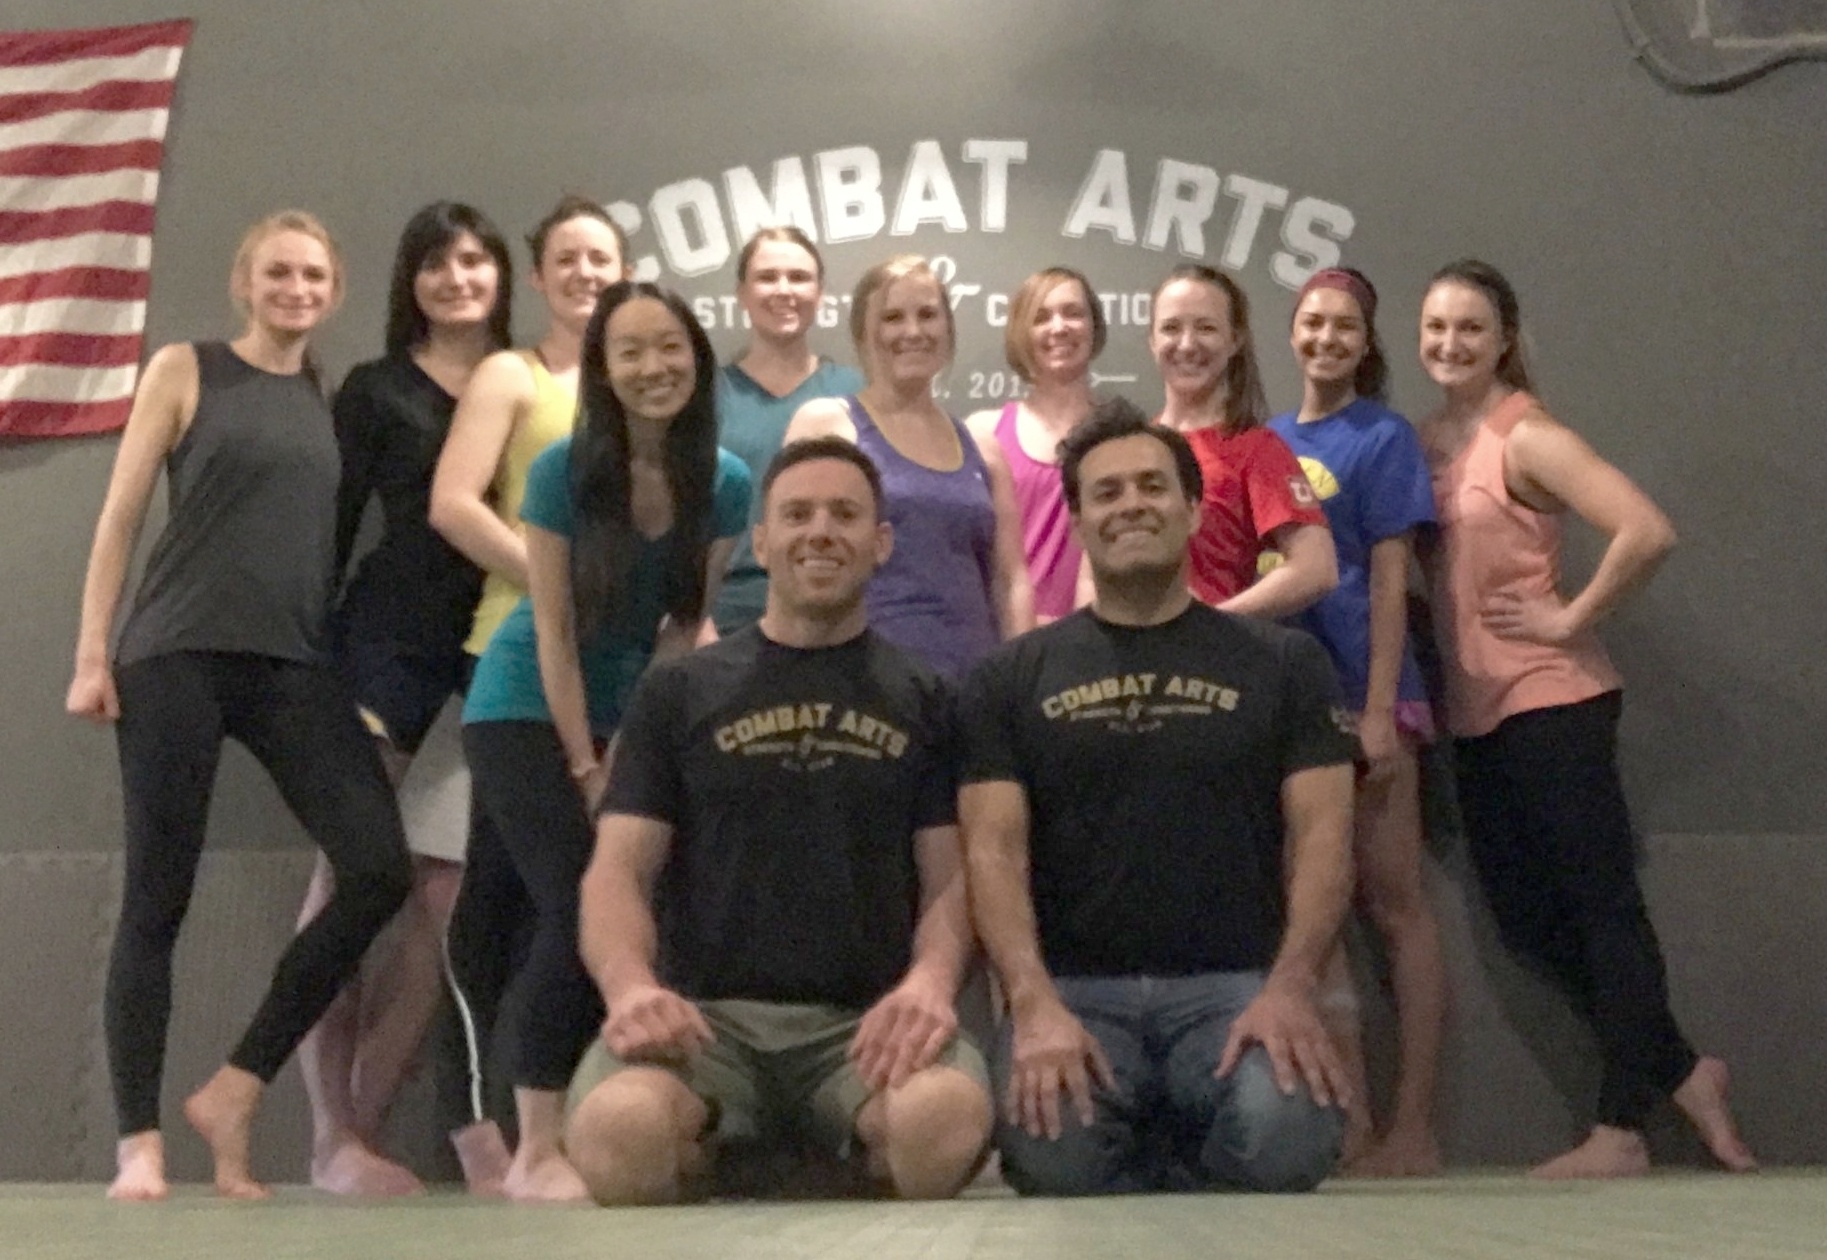 U of U Medical Students self defense workshop